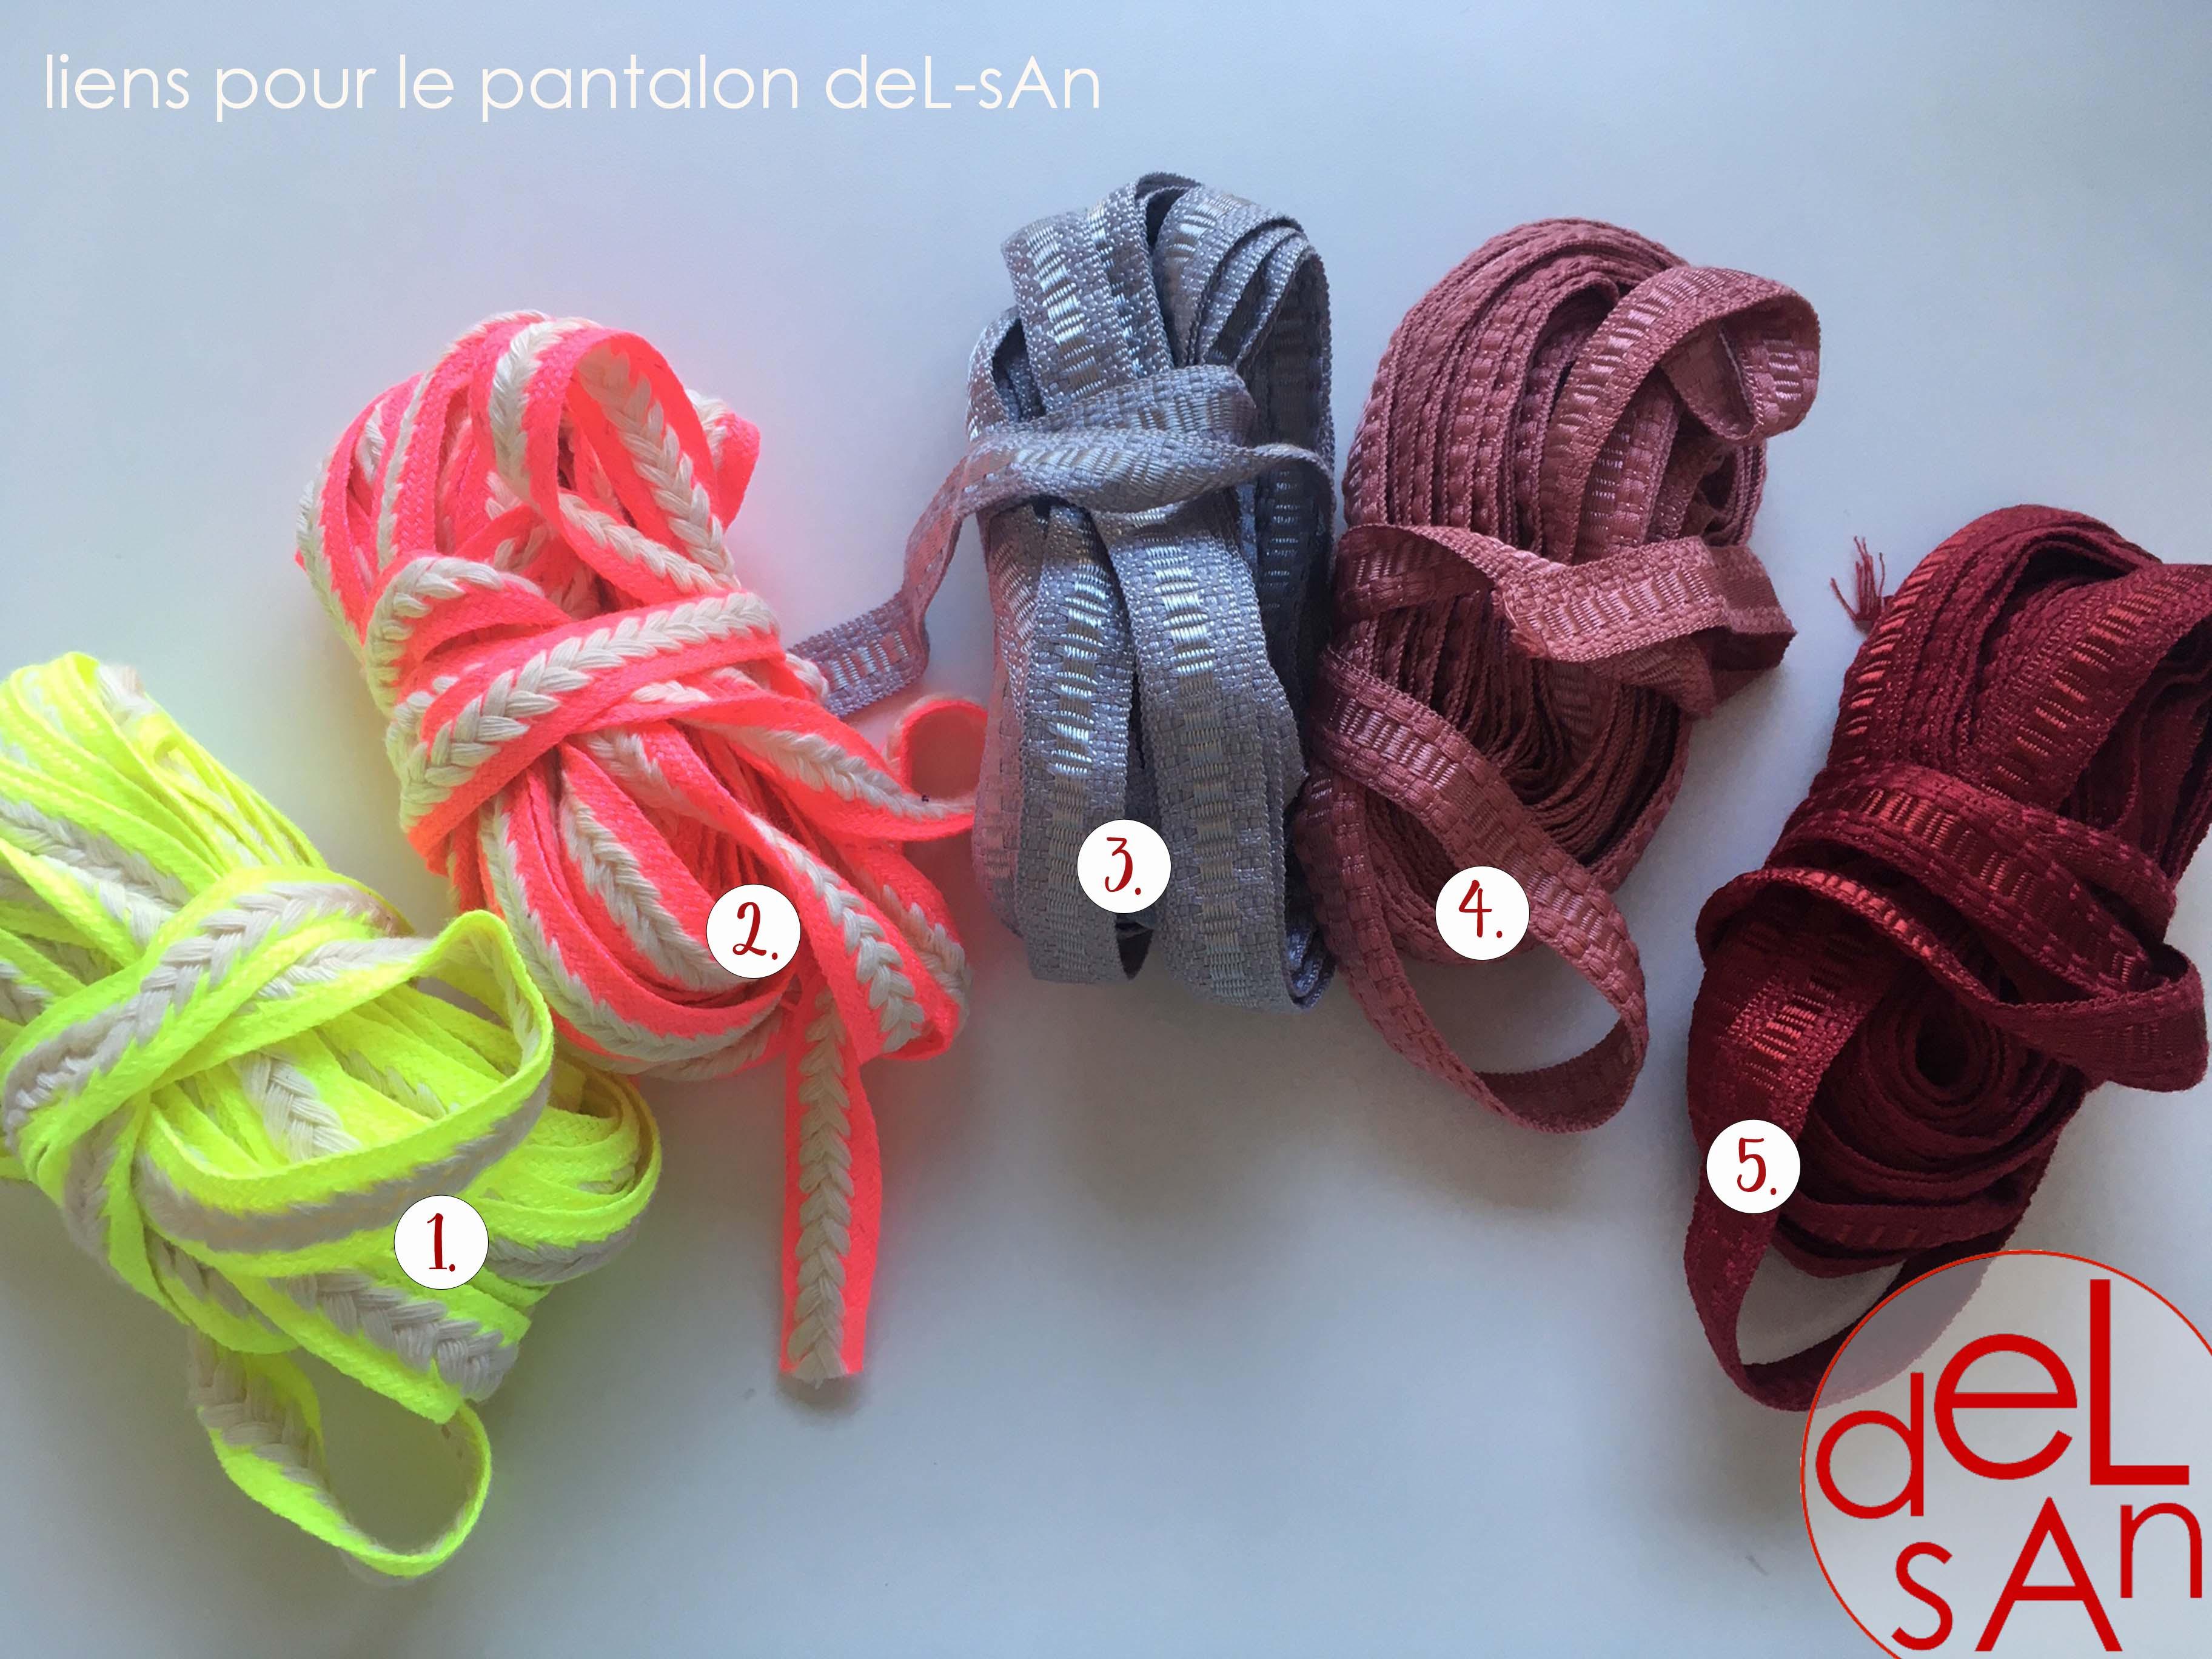 delsan - liens pour pantalon cordons 1